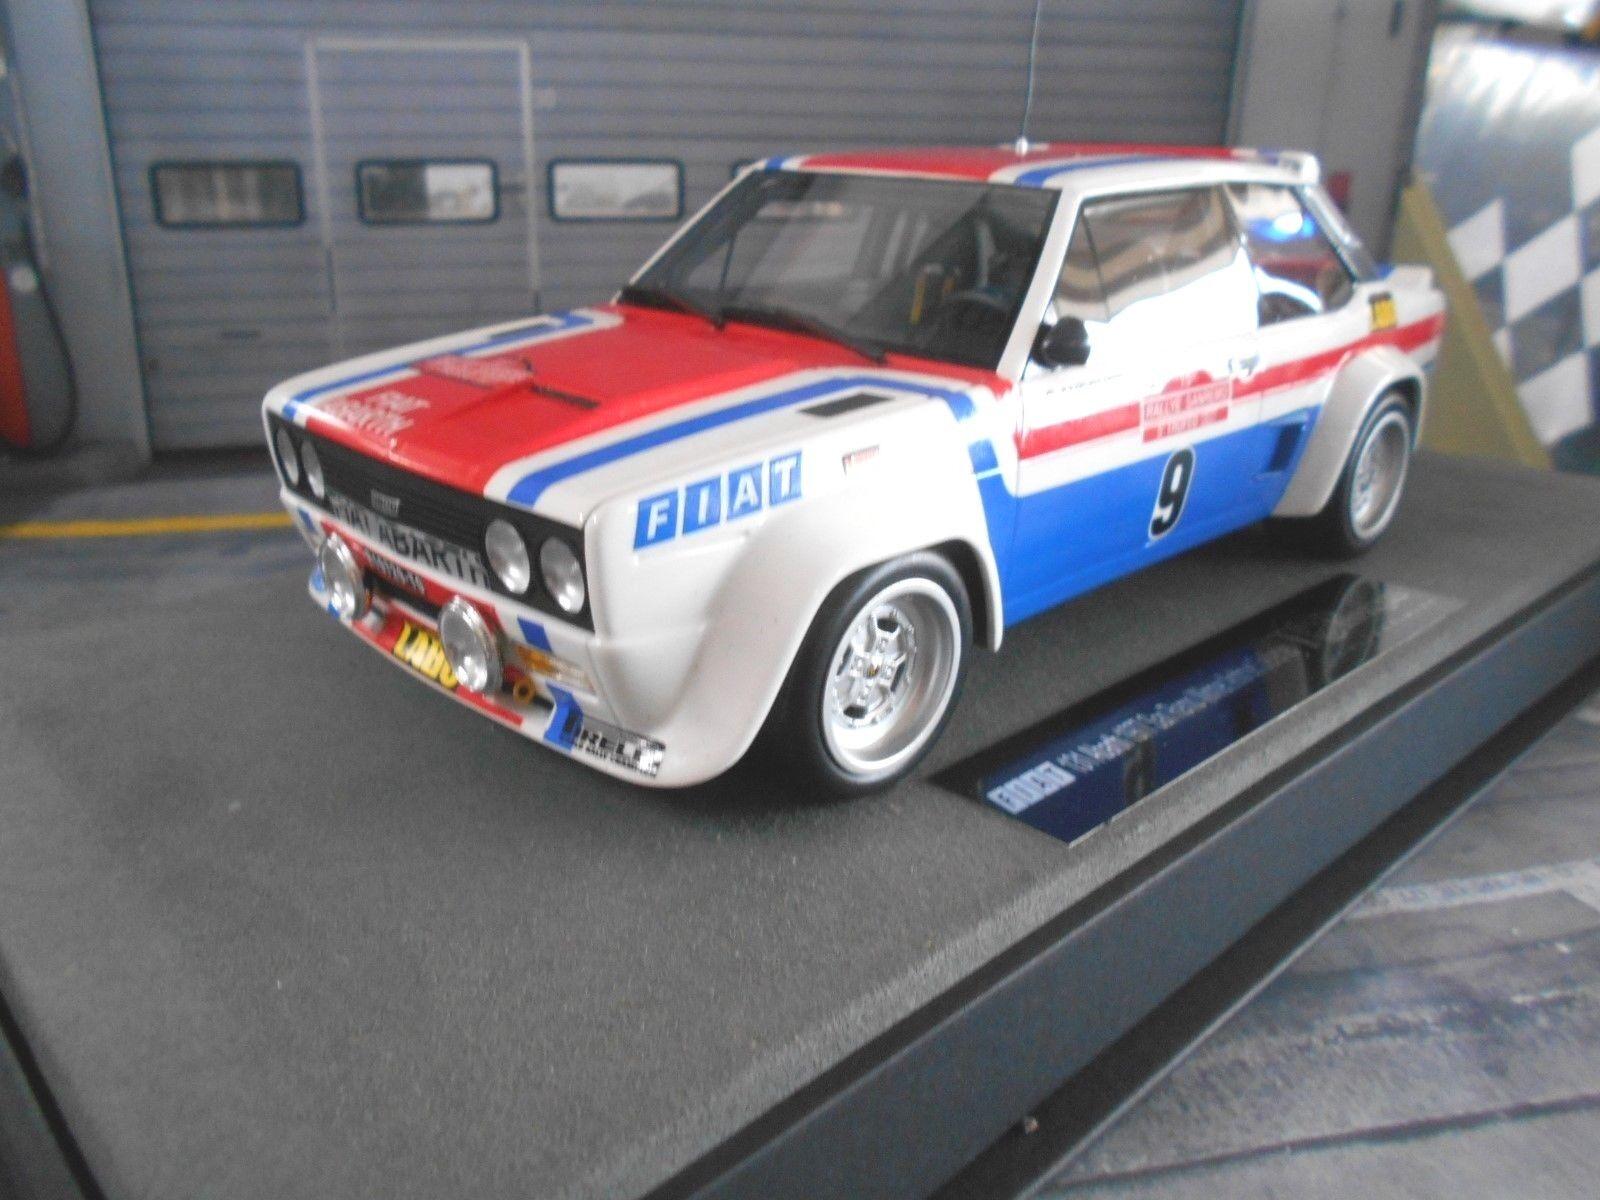 Fiat 131 Abarth Rallye San Remo 1977 Winner  9 Andruet vainqueur Top Marques 1 18